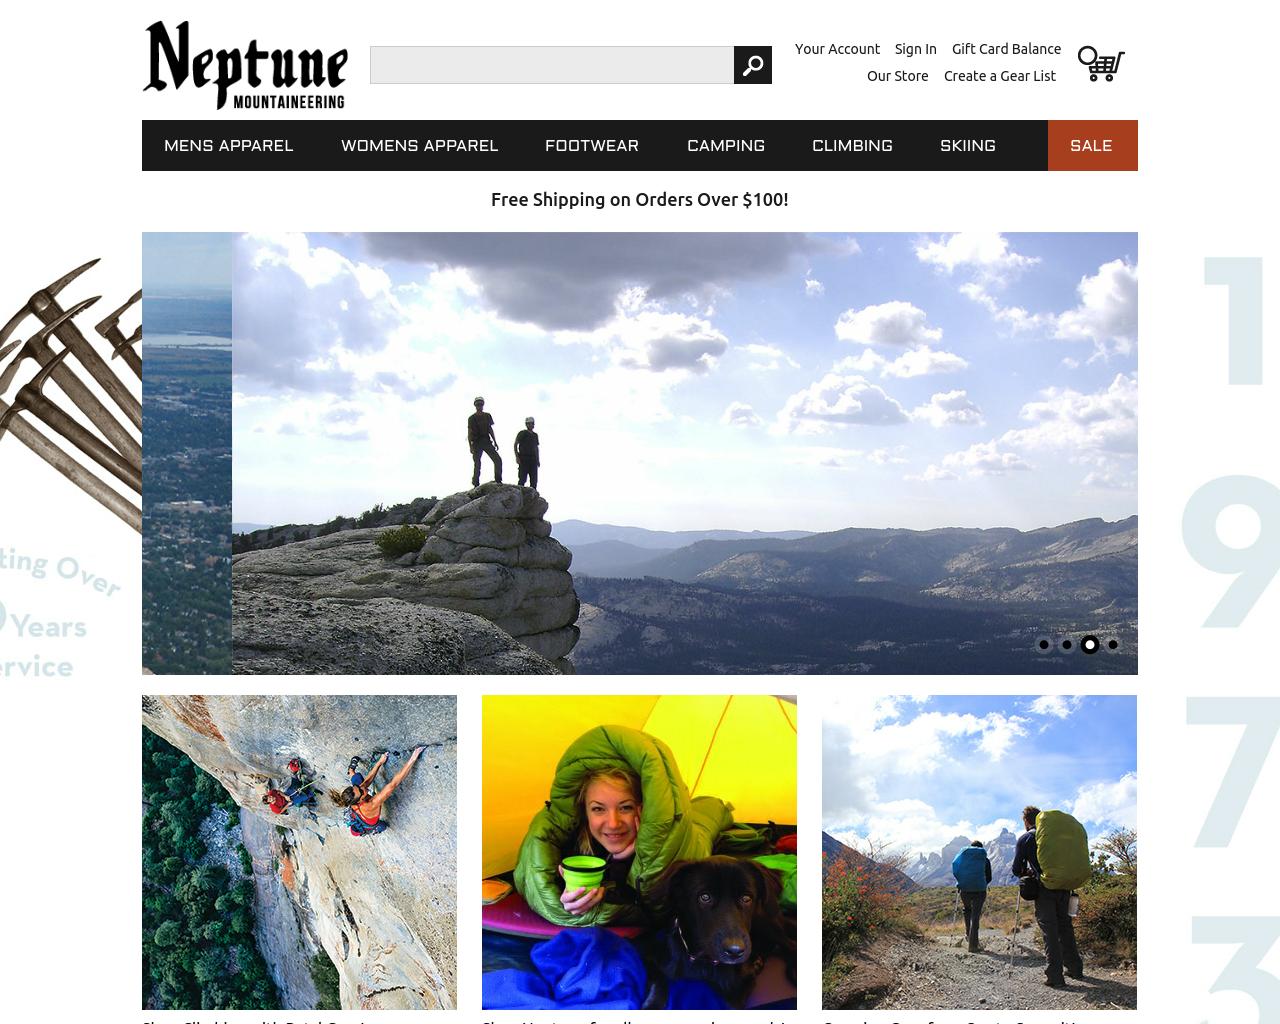 Neptune-Mountaineering-Advertising-Reviews-Pricing